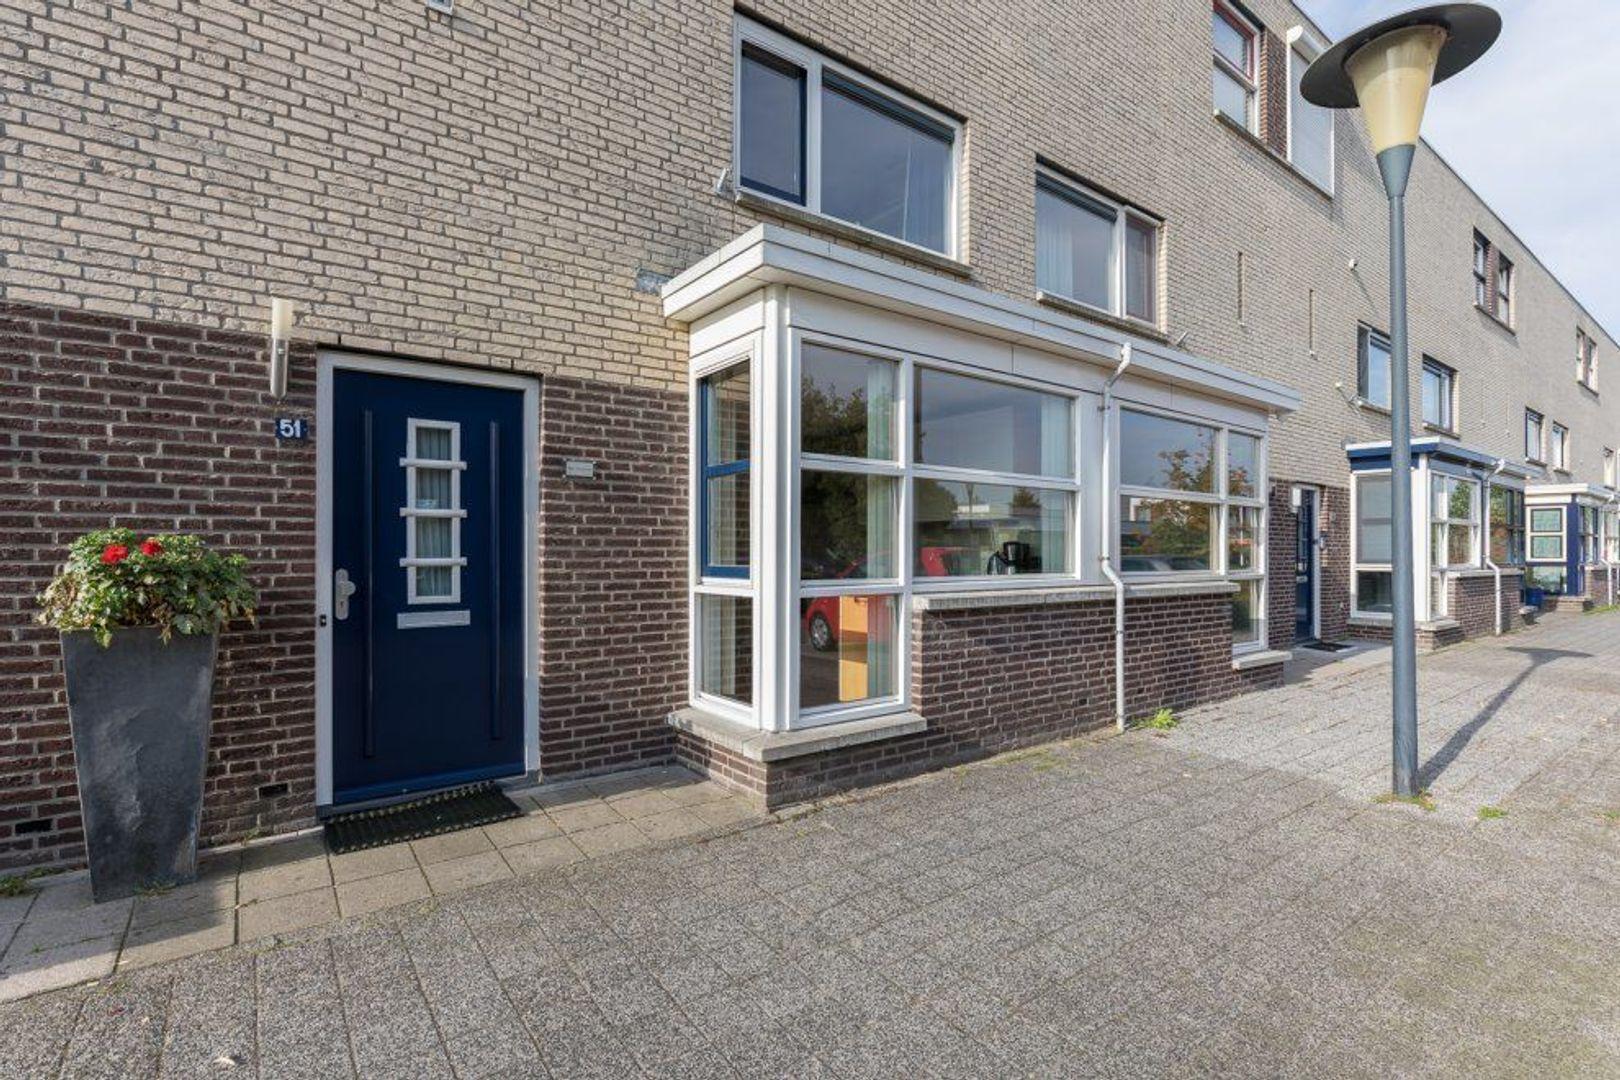 Noordeloosstraat 51, Zoetermeer foto-2